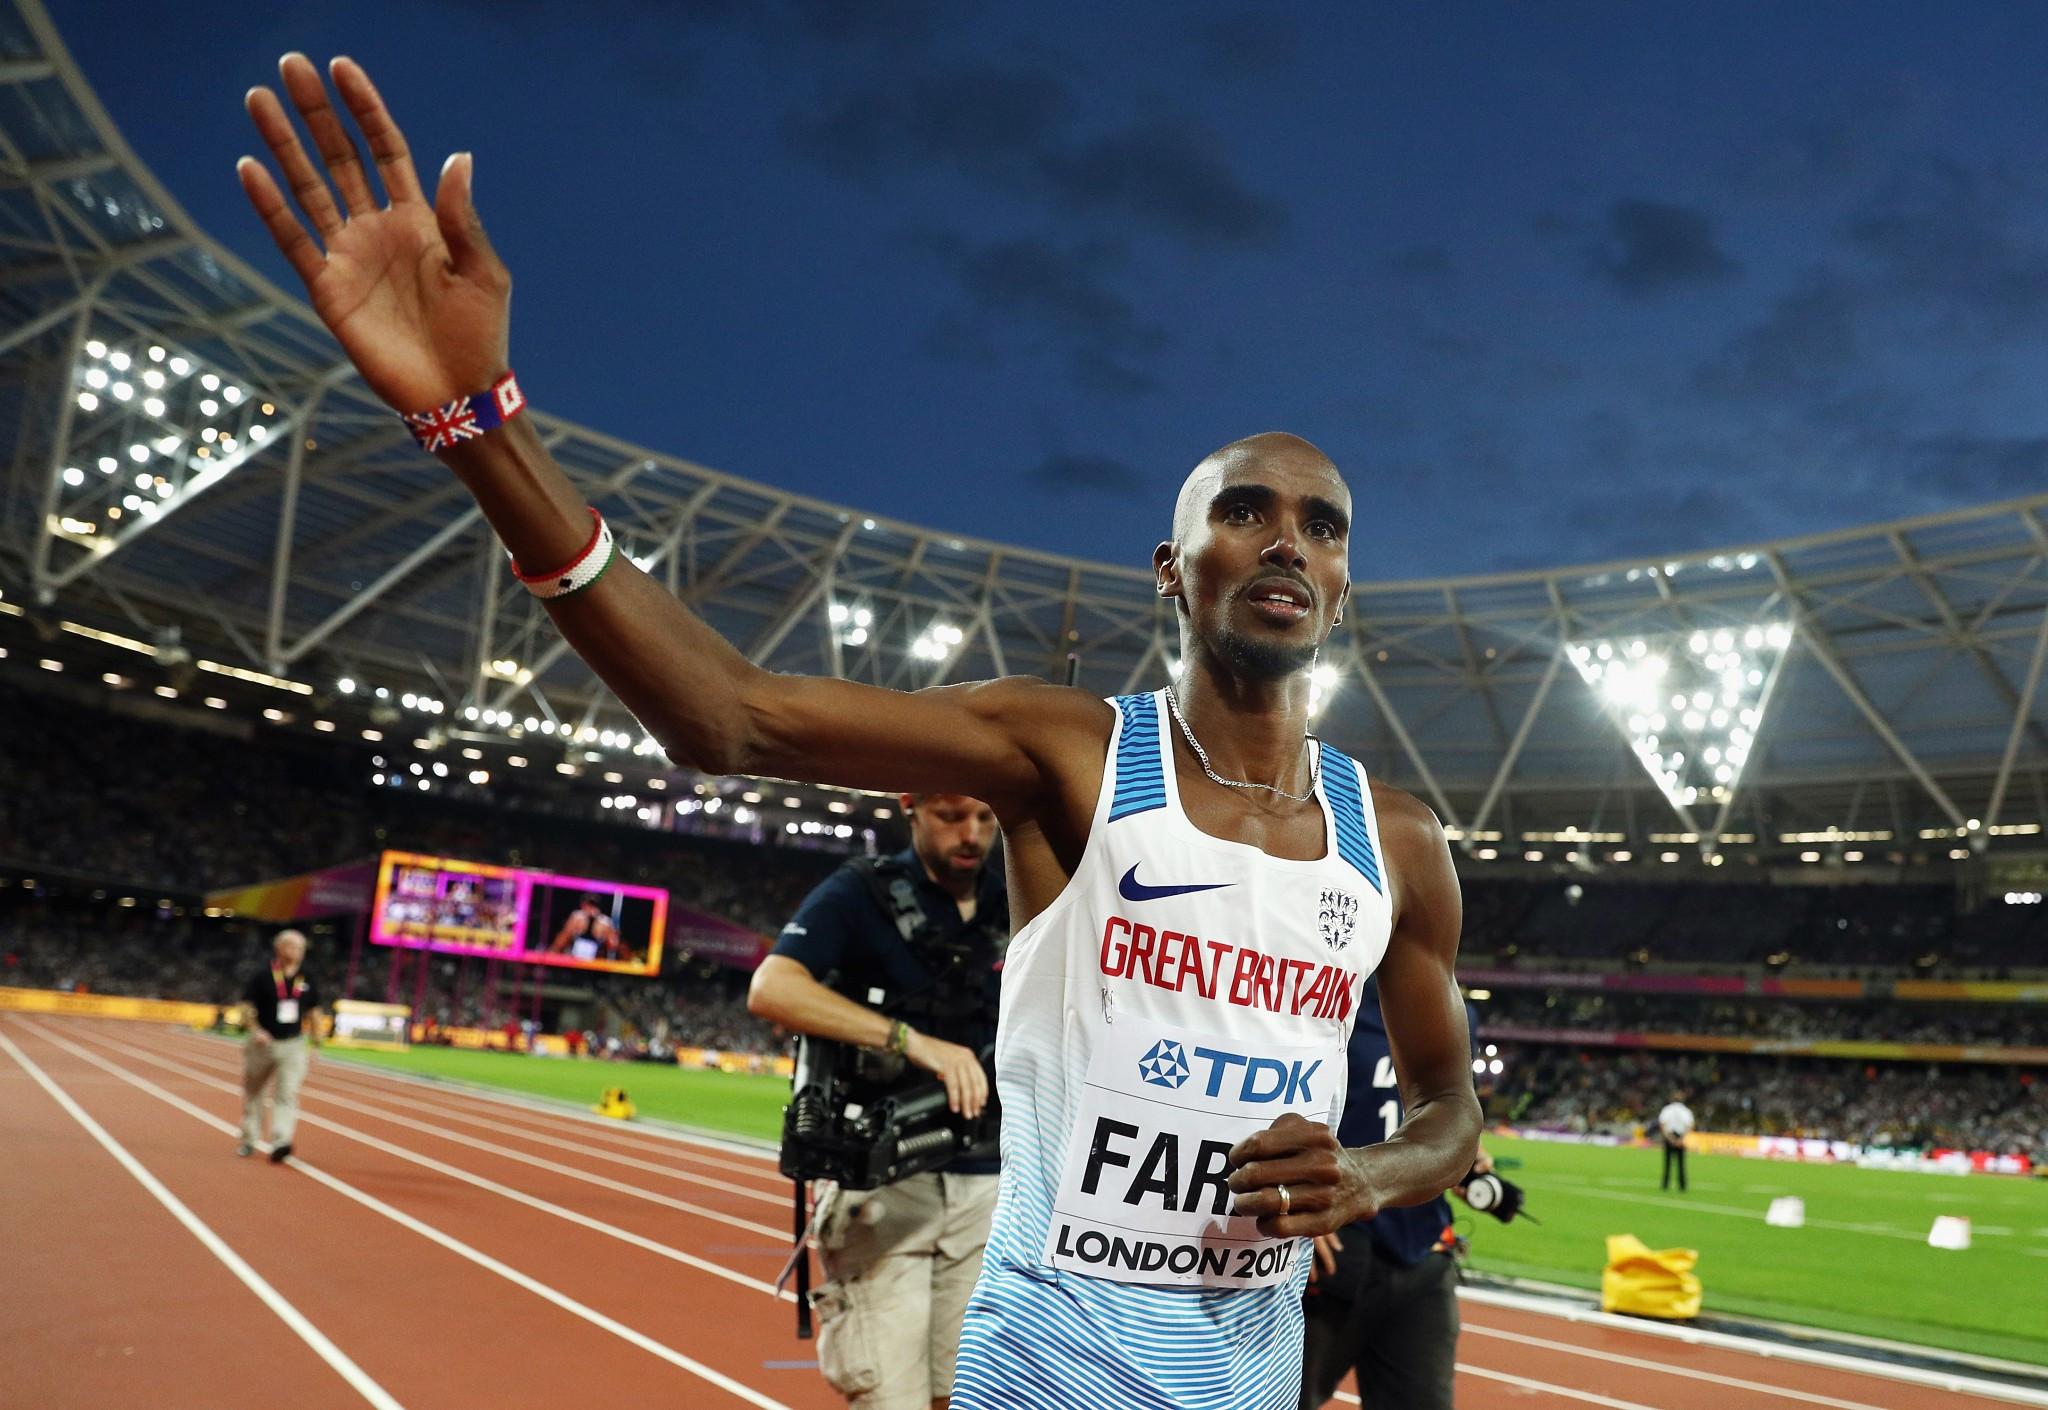 Sir Mo Farah backs Birmingham's 2022 Commonwealth Games bid